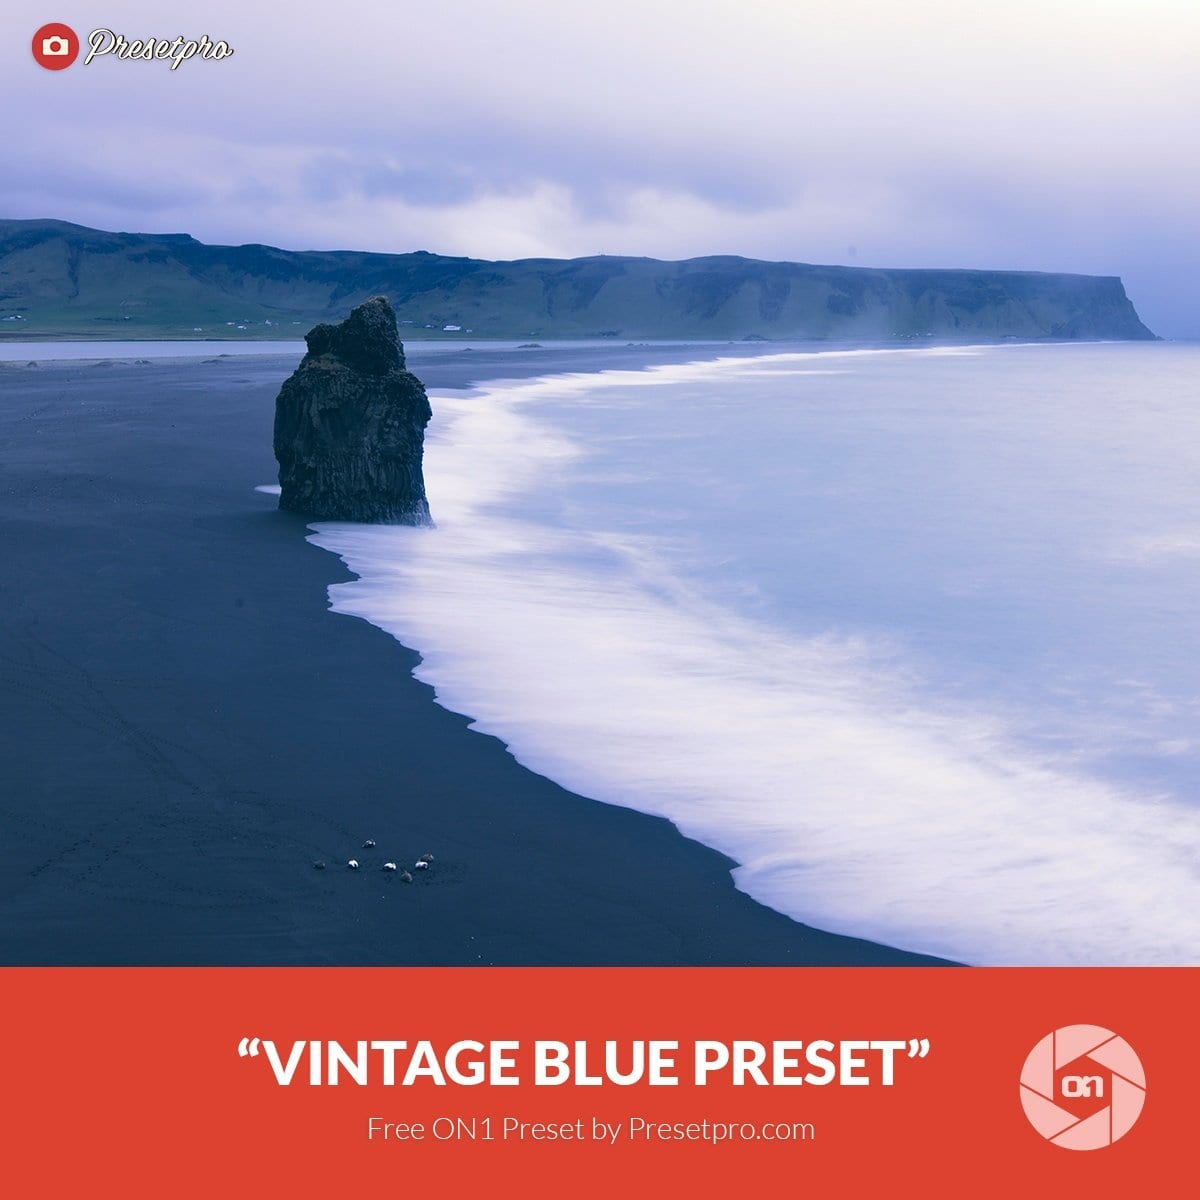 Free-On1-Preset-Vintage-Blue-Presetpro.com